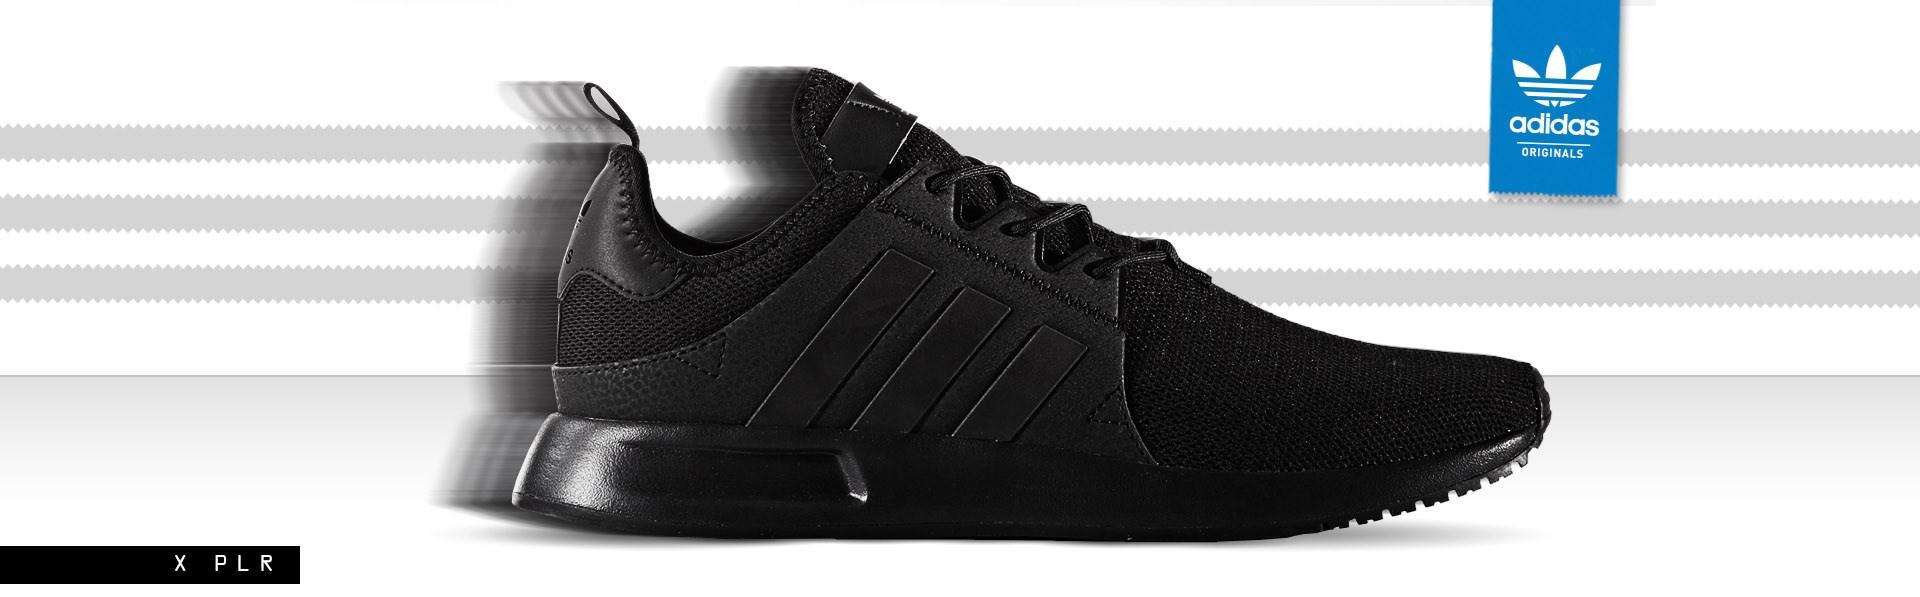 Adidas X PLR Preto